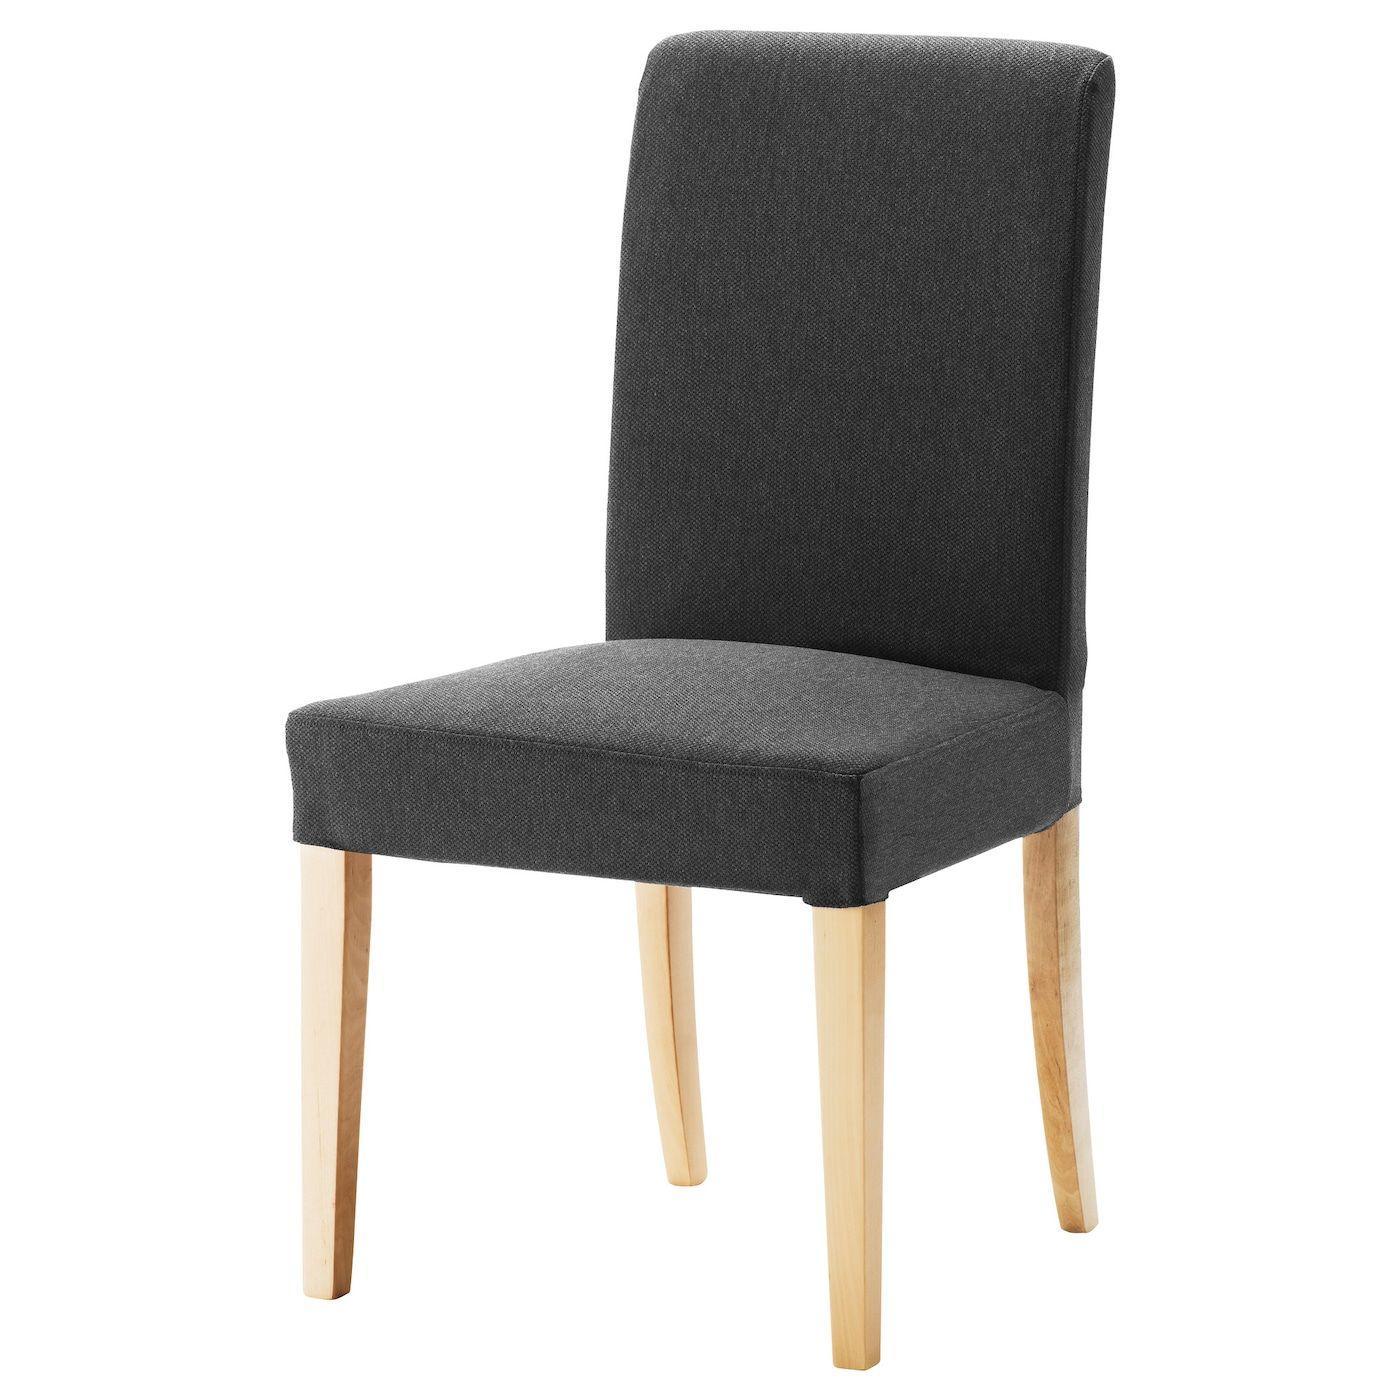 Ikea Hoher Stuhl